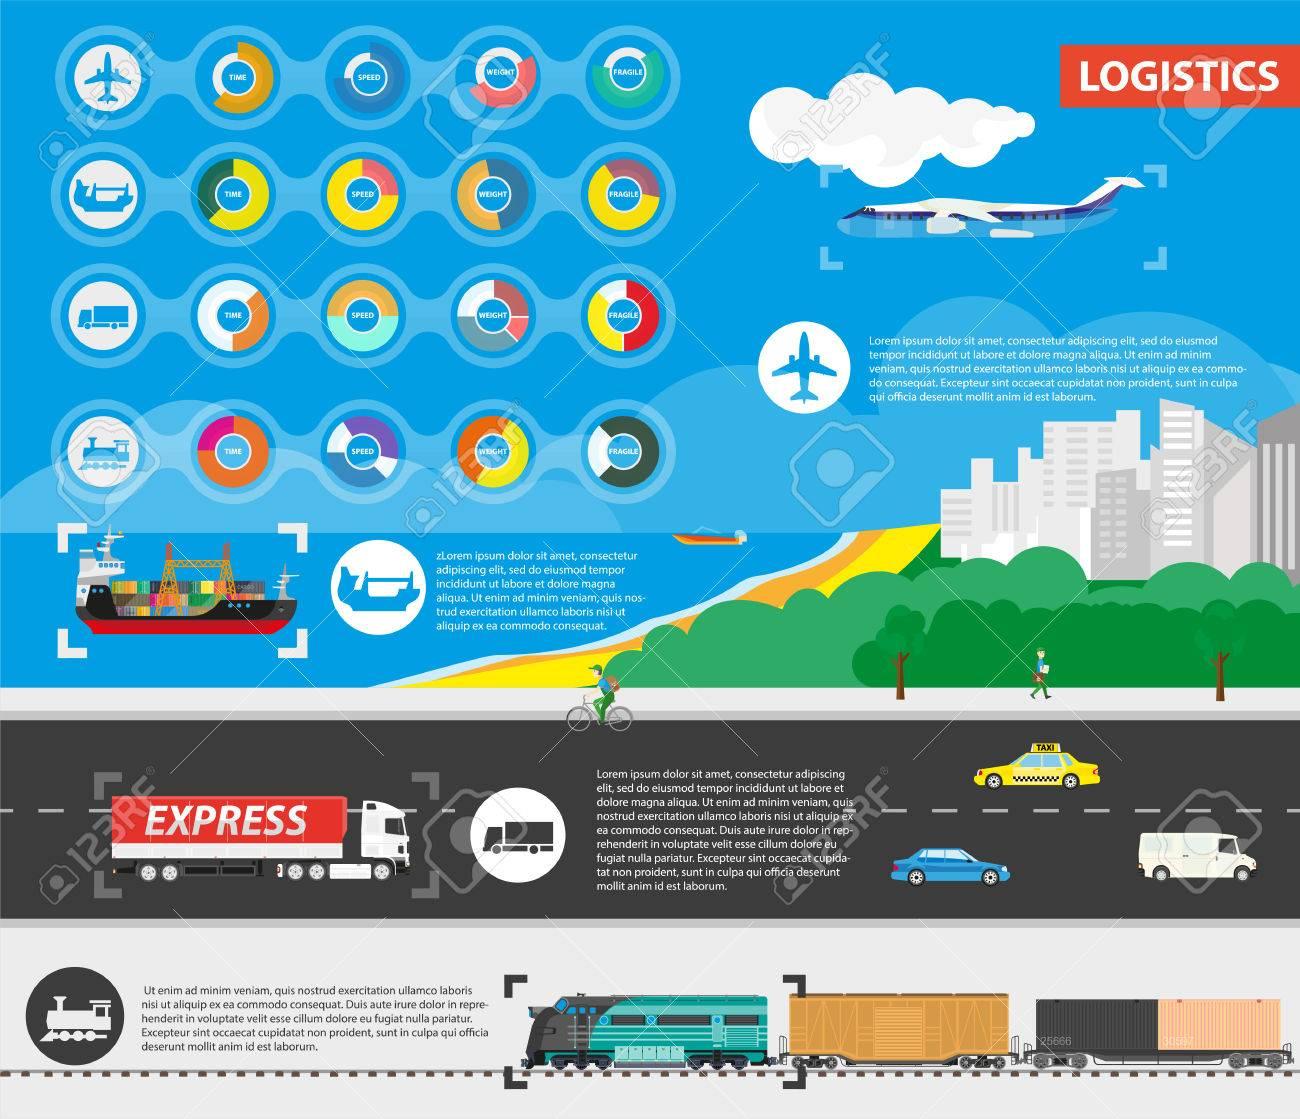 Logistics Best Delivery Means of Transportation